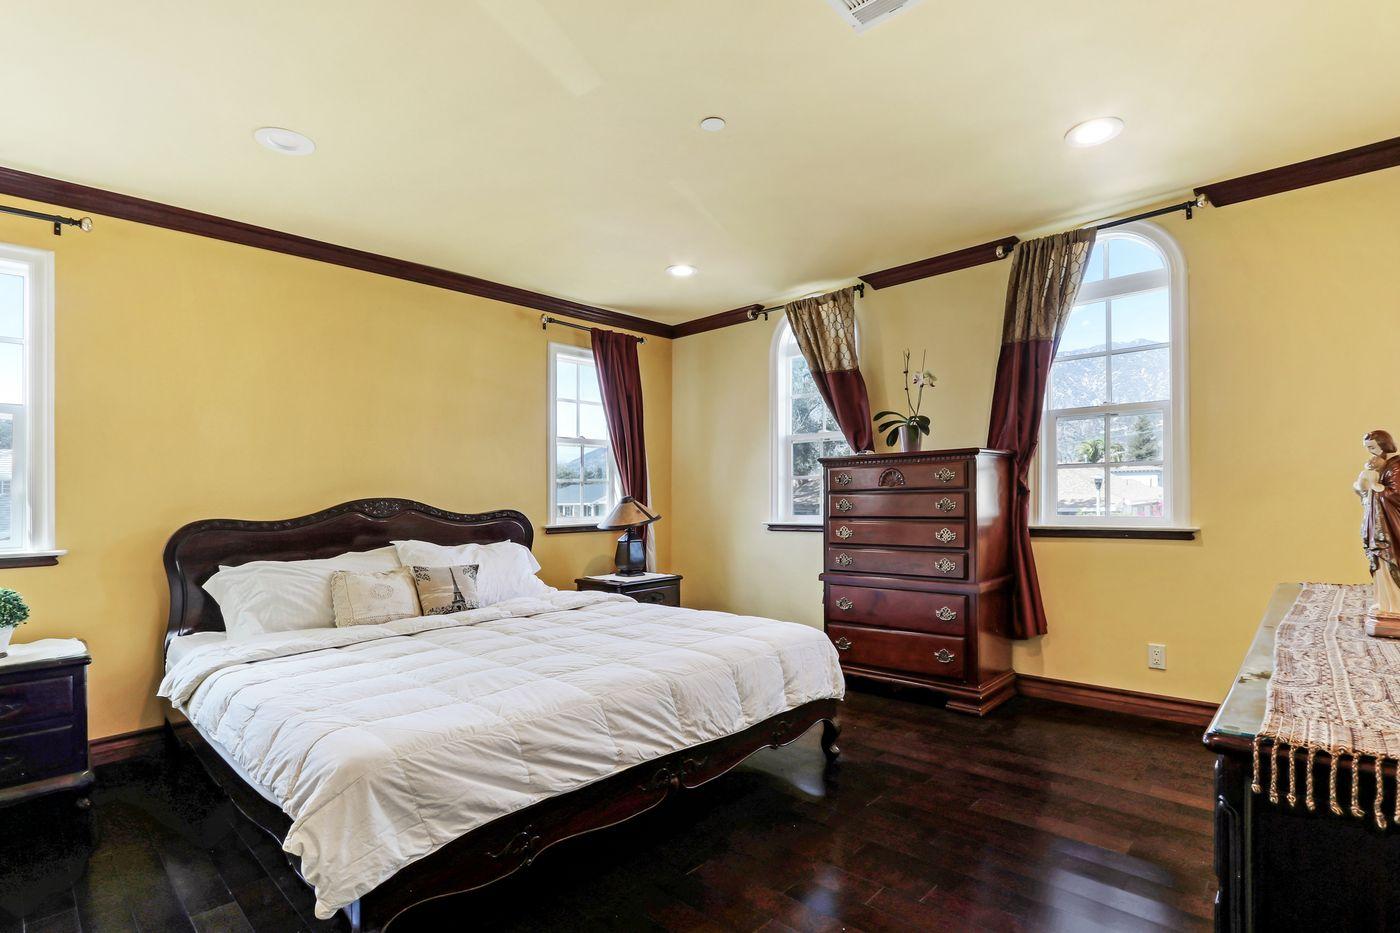 real-estate-photography-los-angeles-pasadena-glendale-burbank-AD-photographer-15